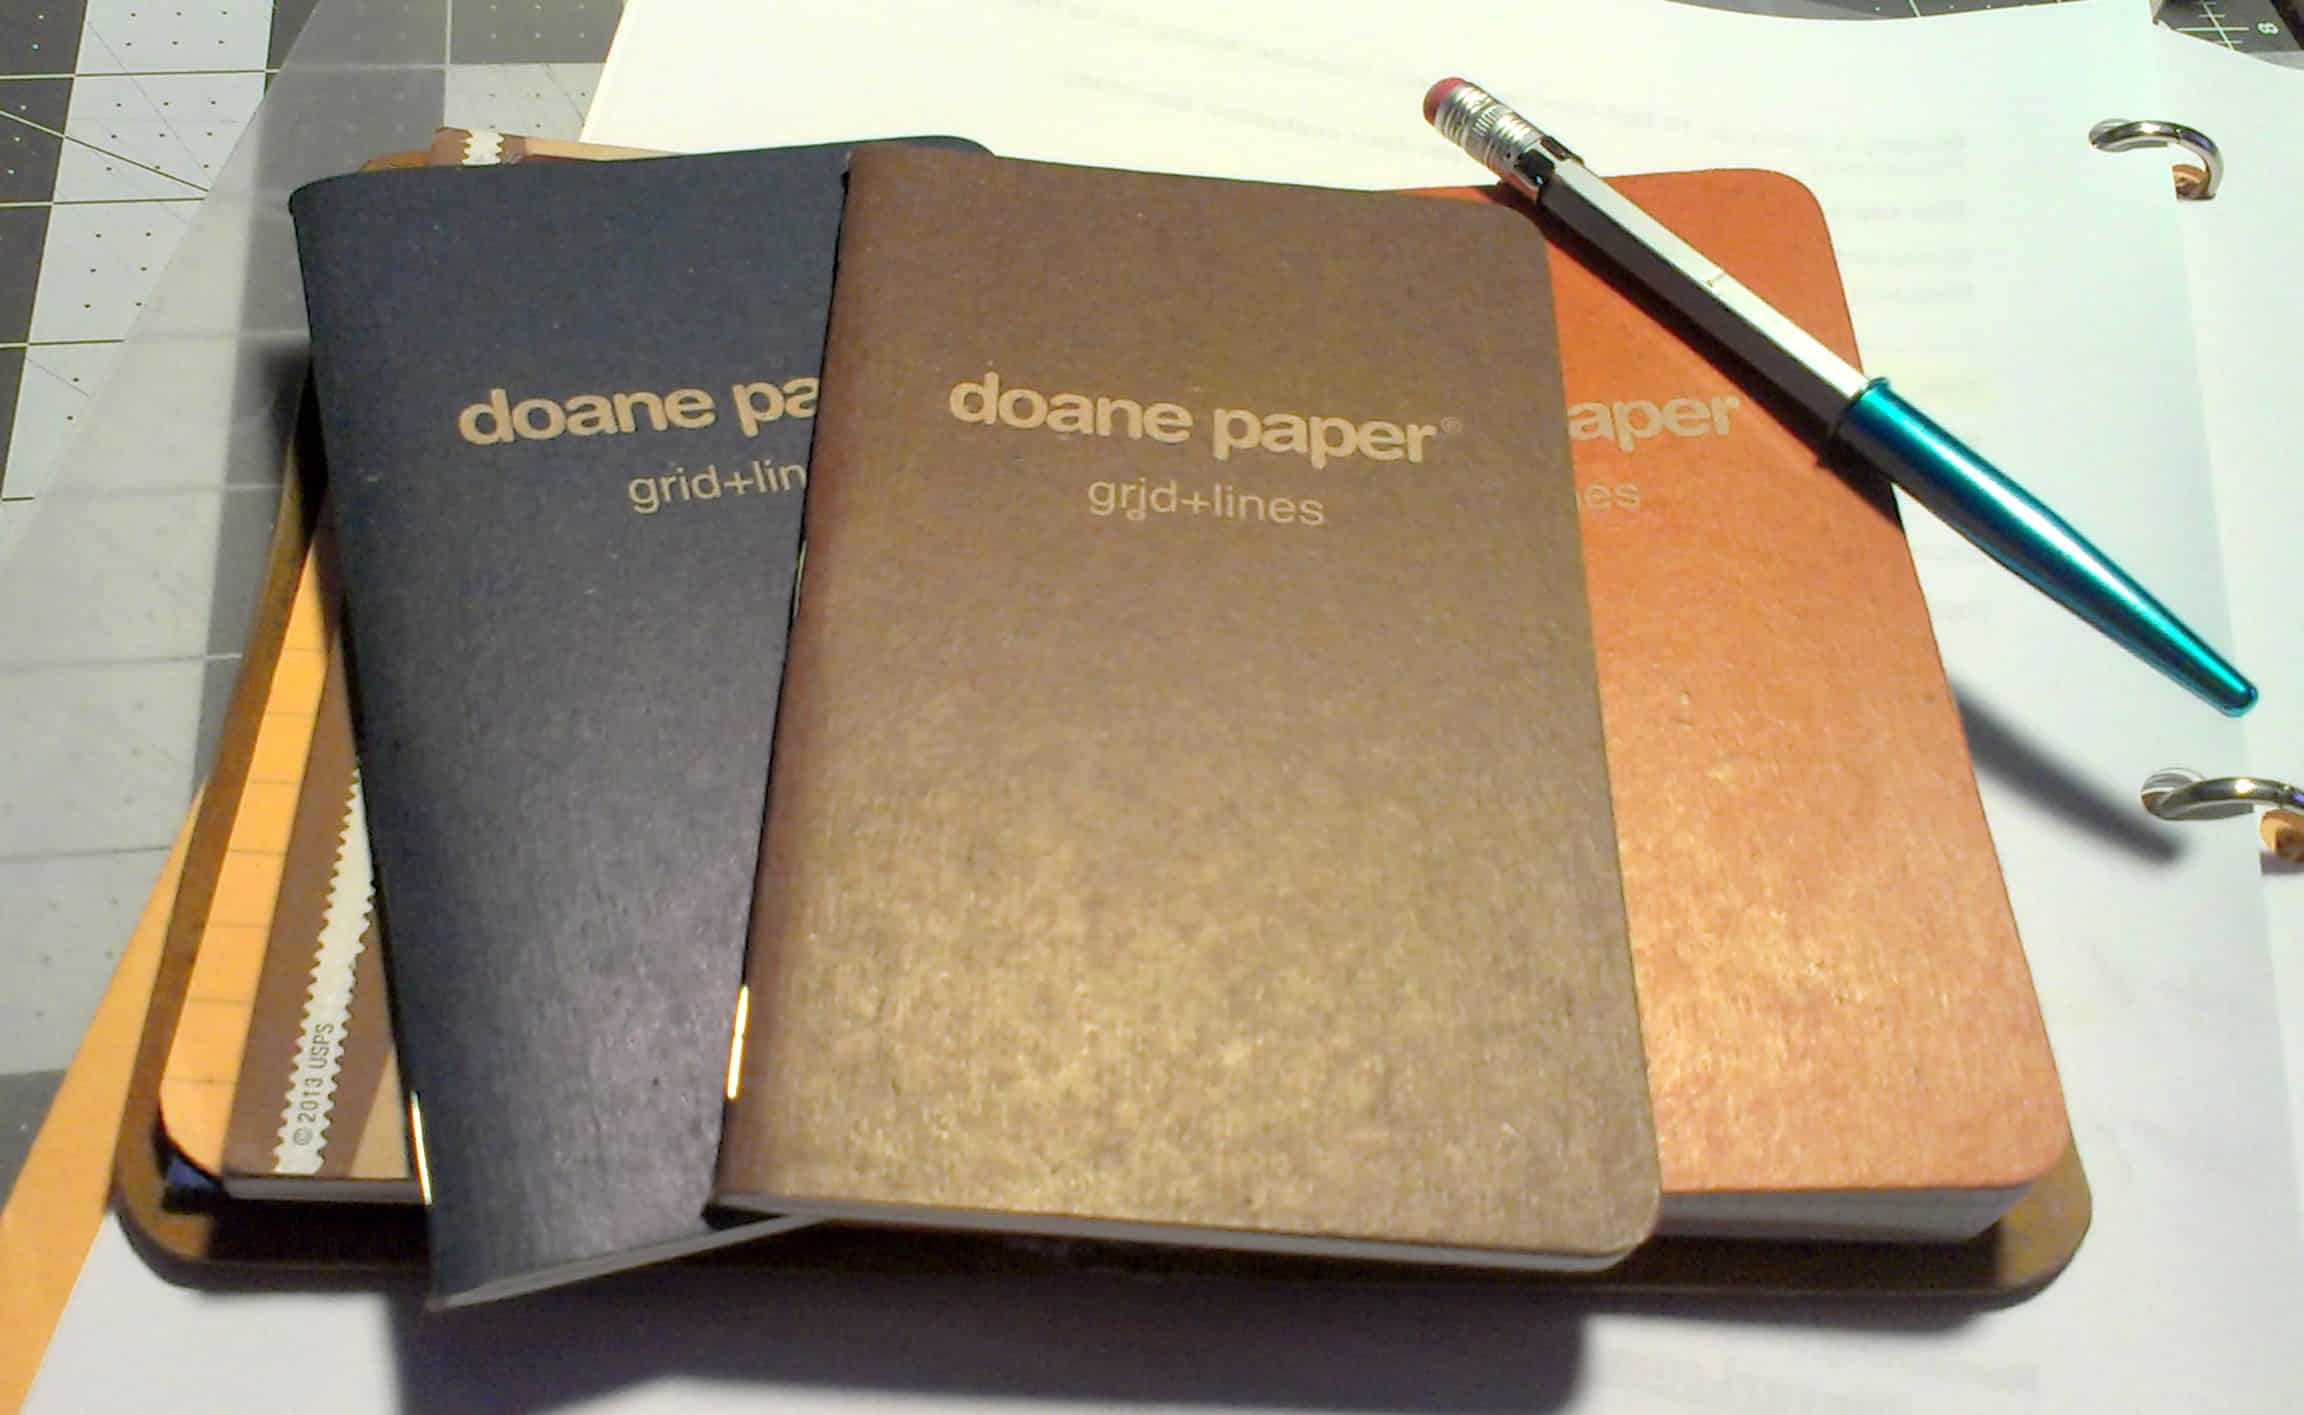 Doane Utility EDC Notebook